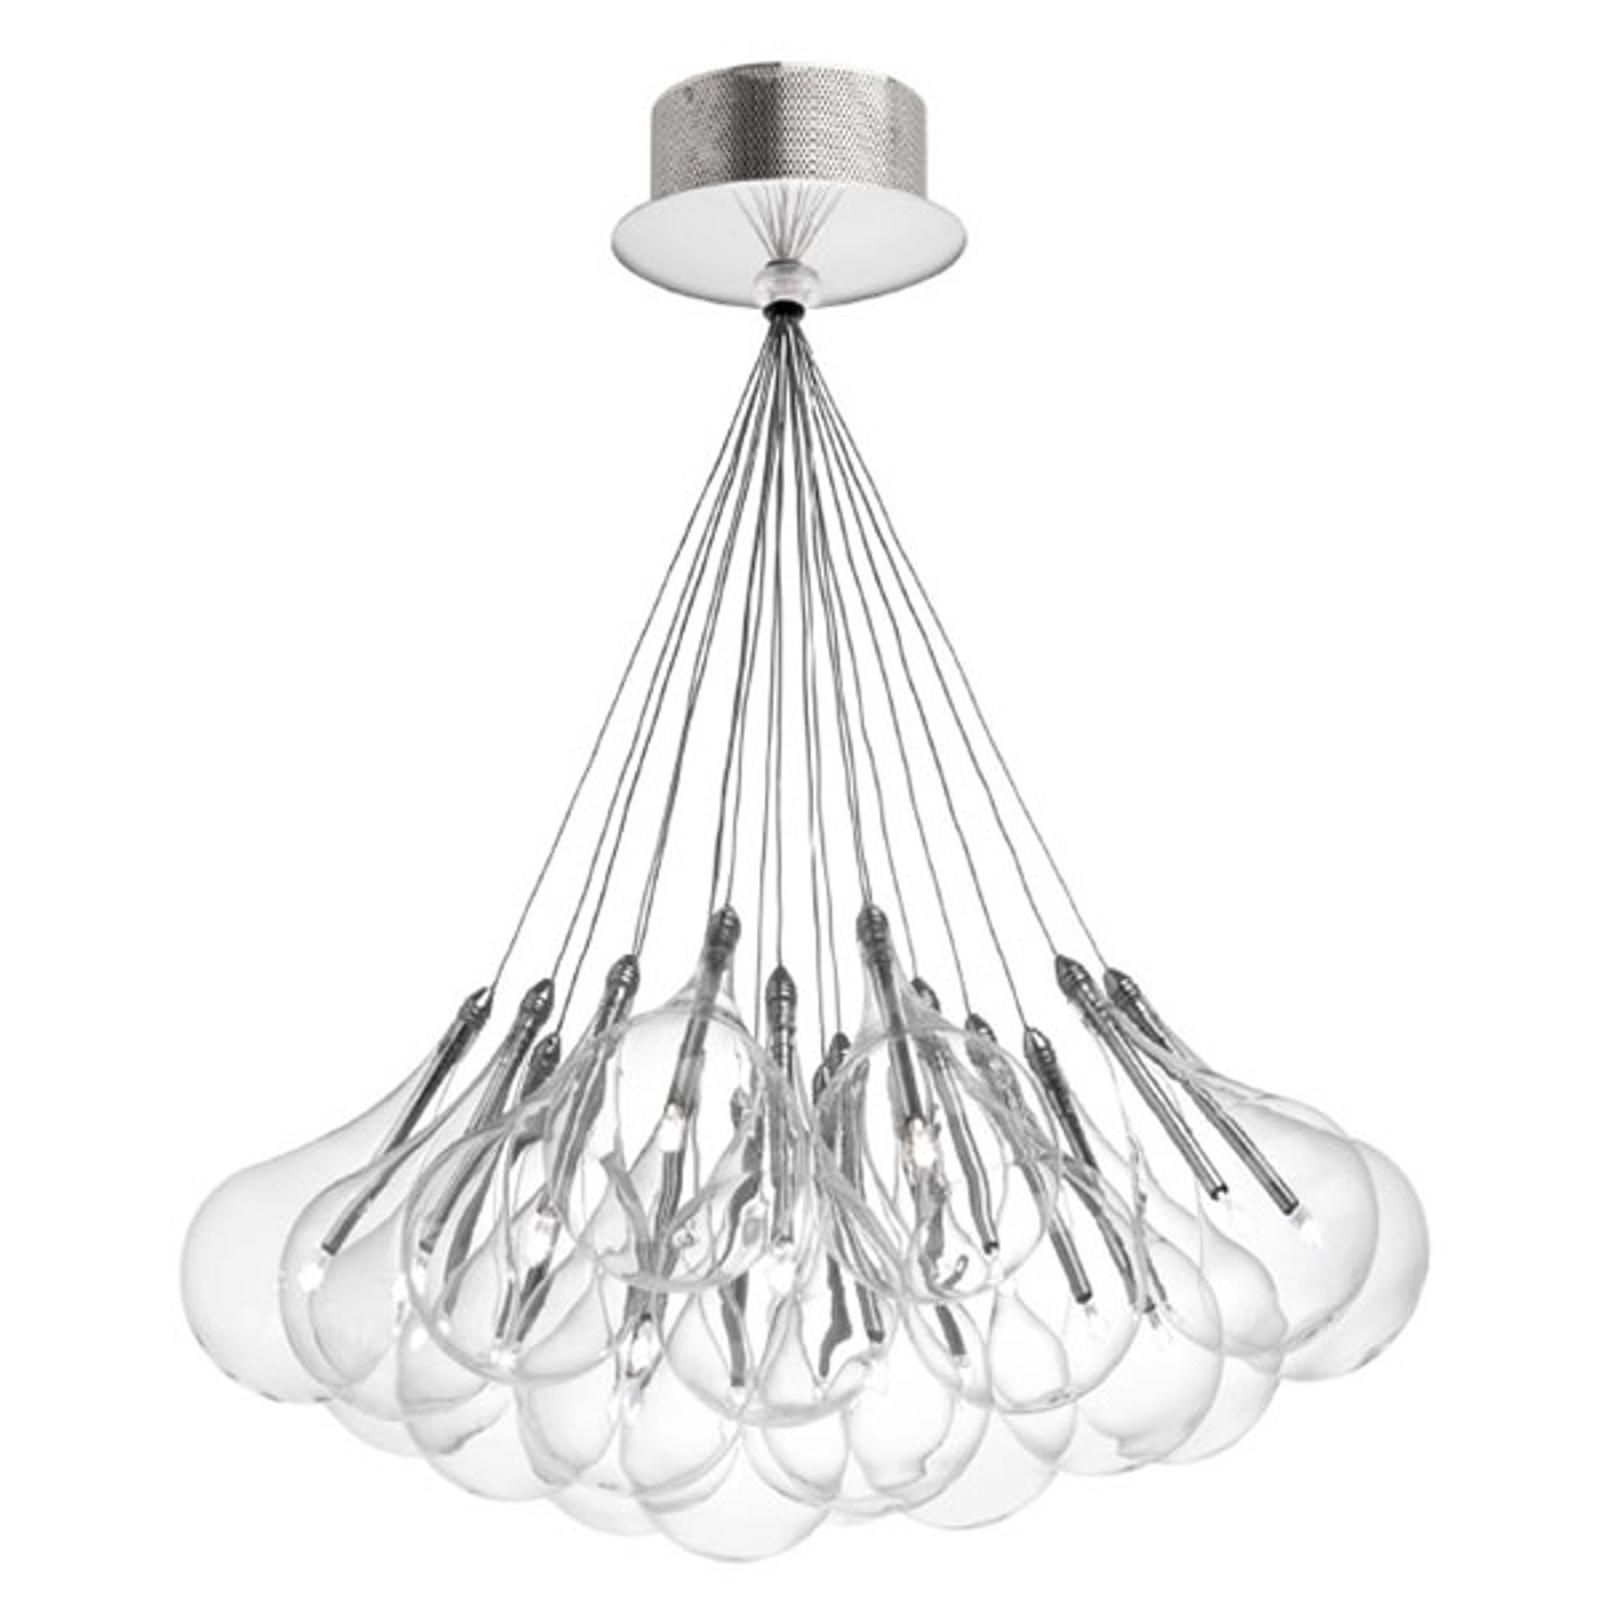 LED-Hängeleuchte Drop S, 19-flammig